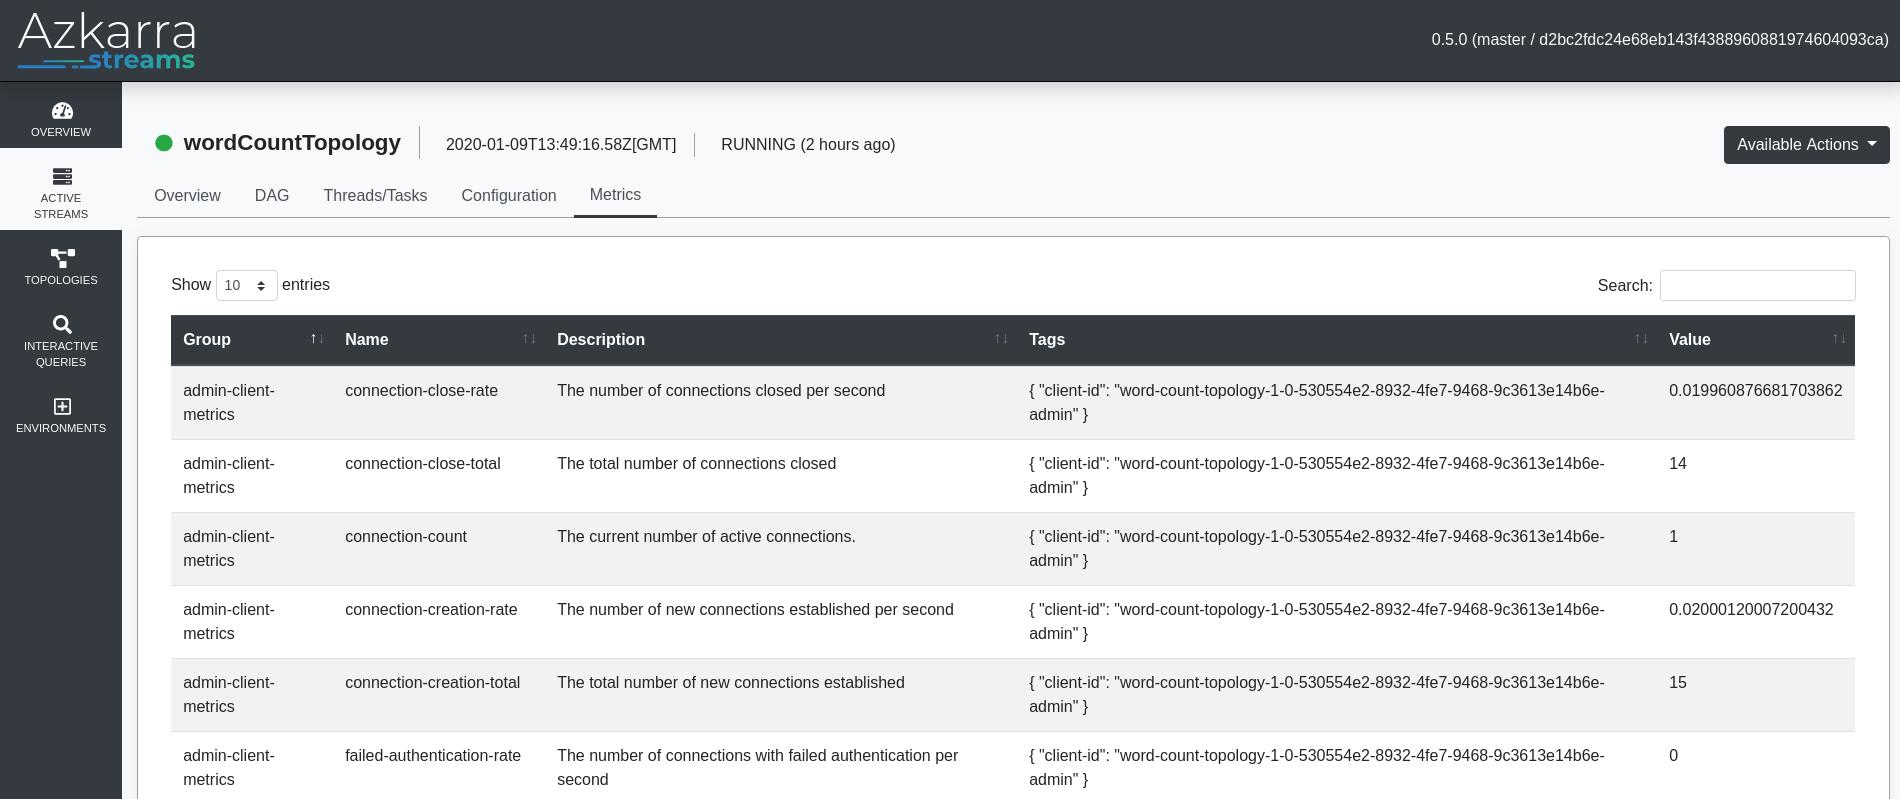 Azkarra WebUI Streams Metrics